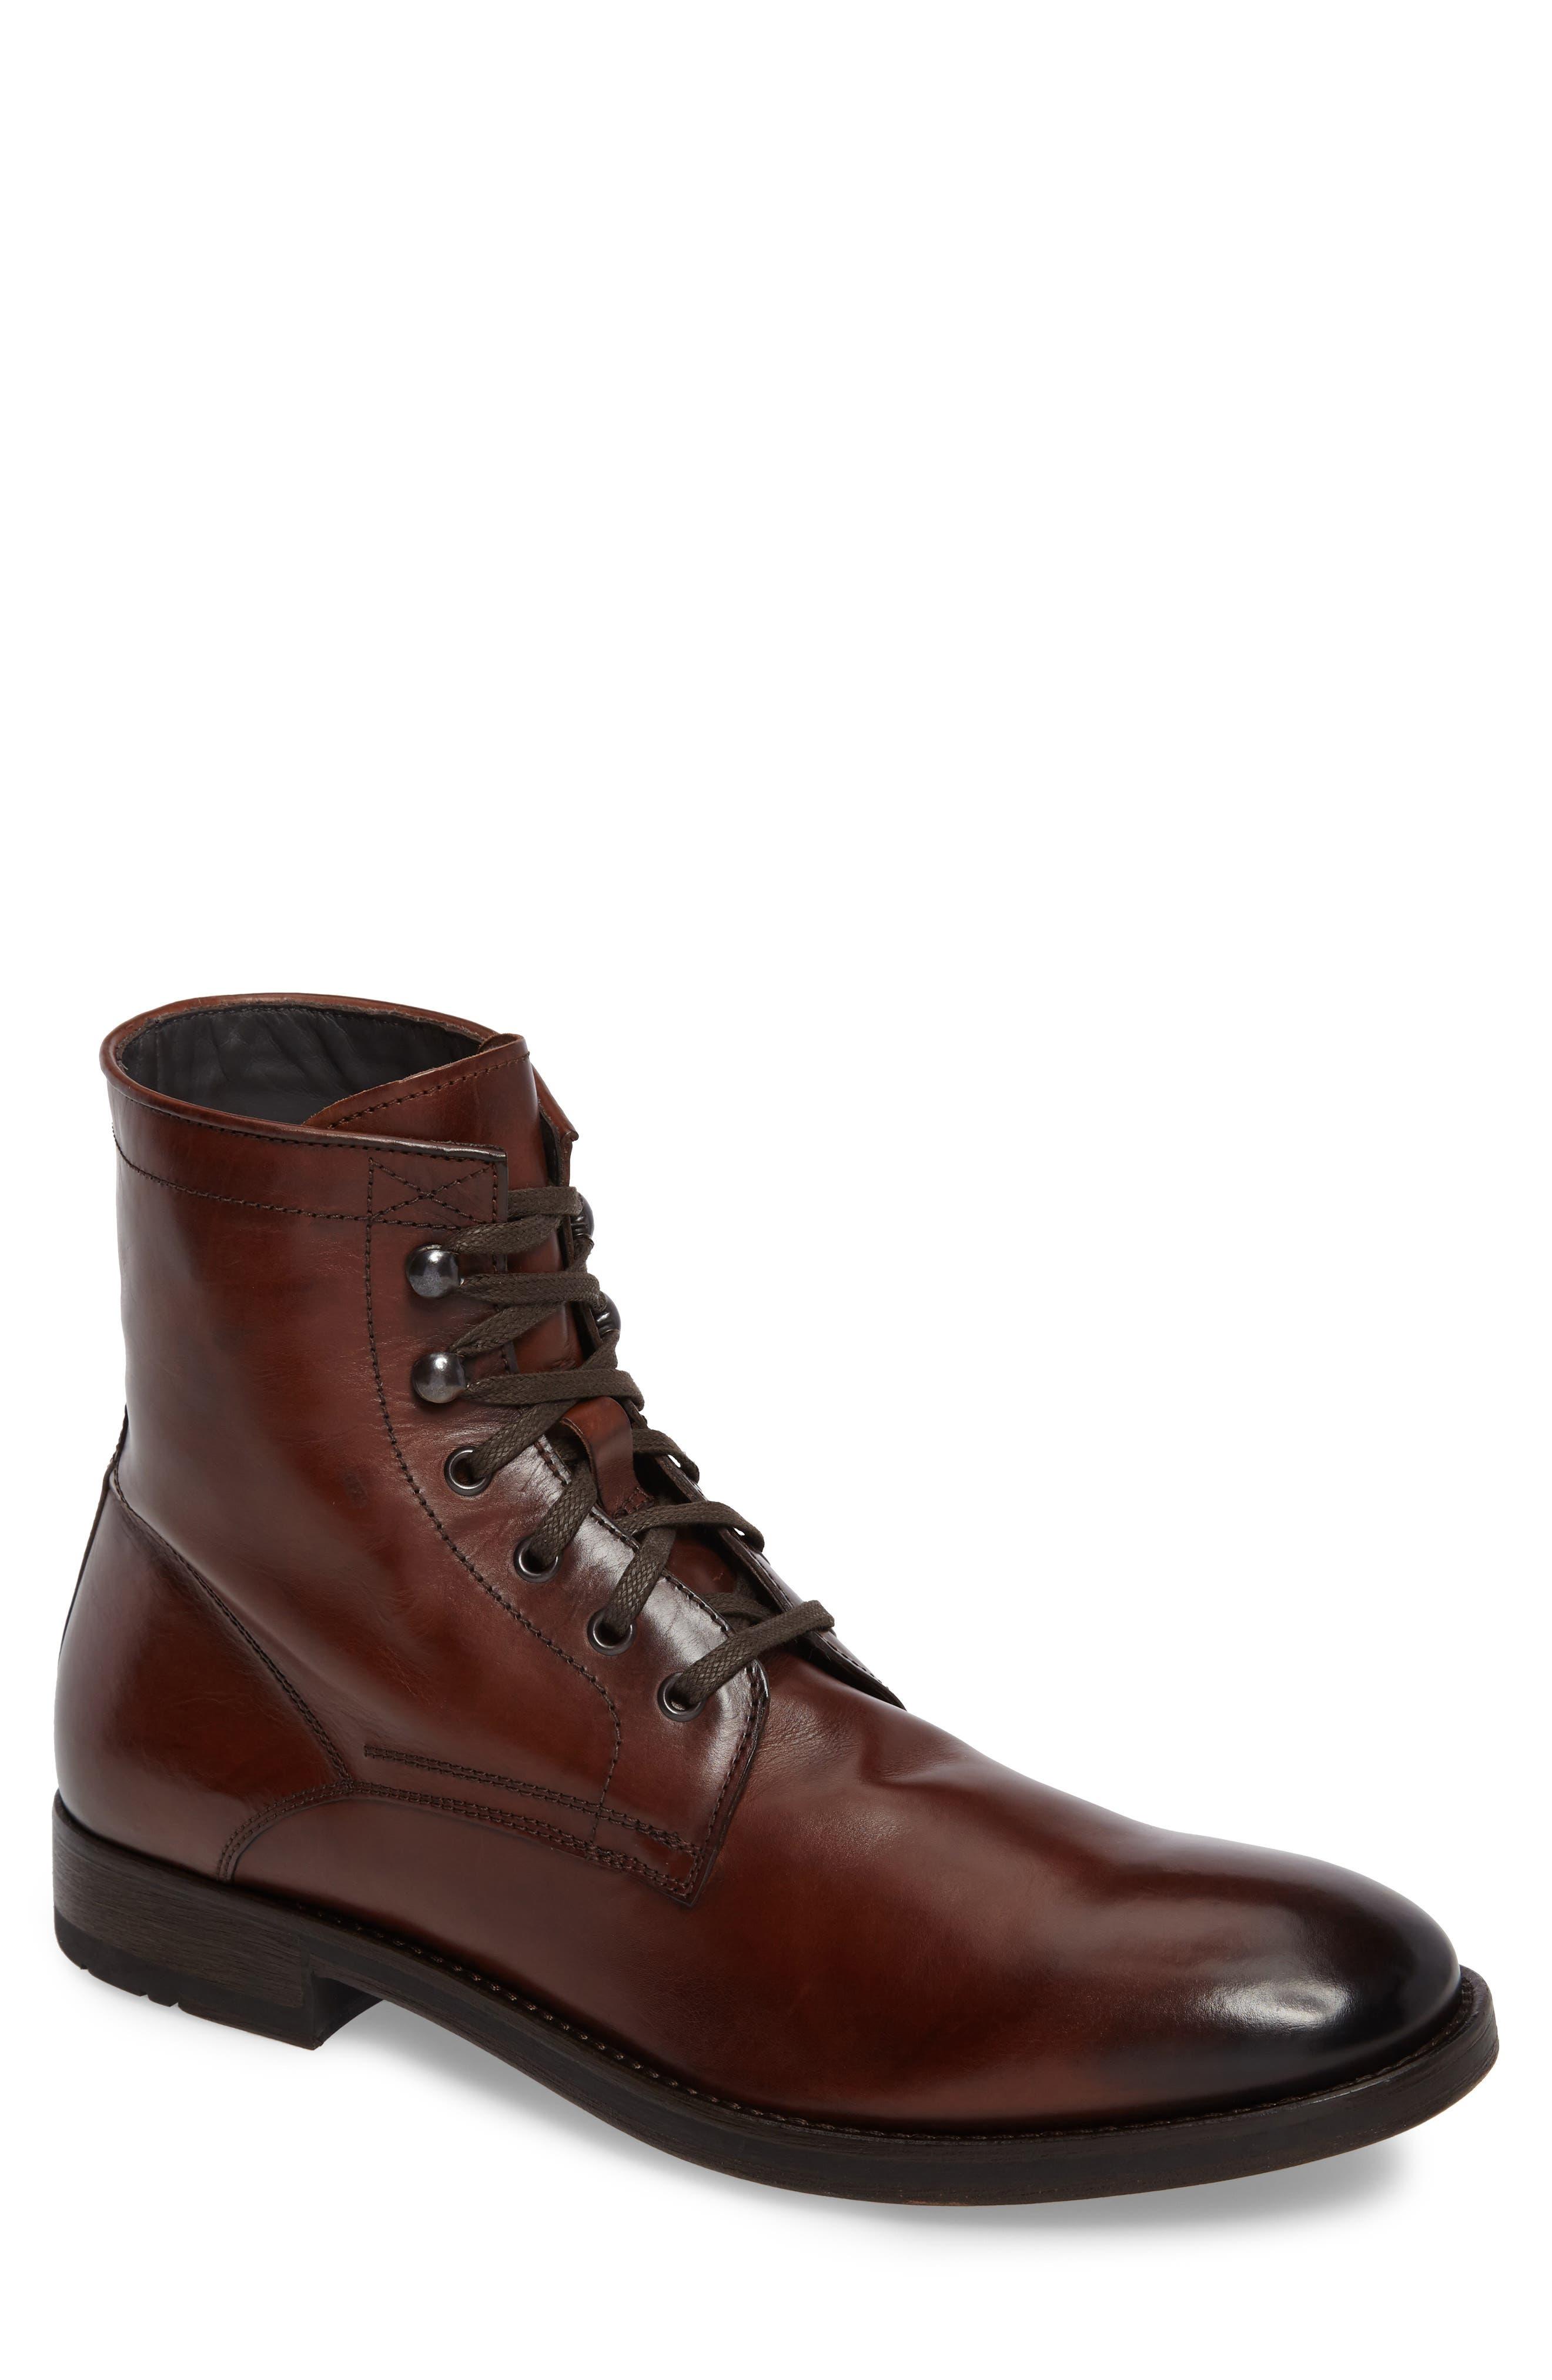 Astoria Plain Toe Boot,                             Main thumbnail 4, color,